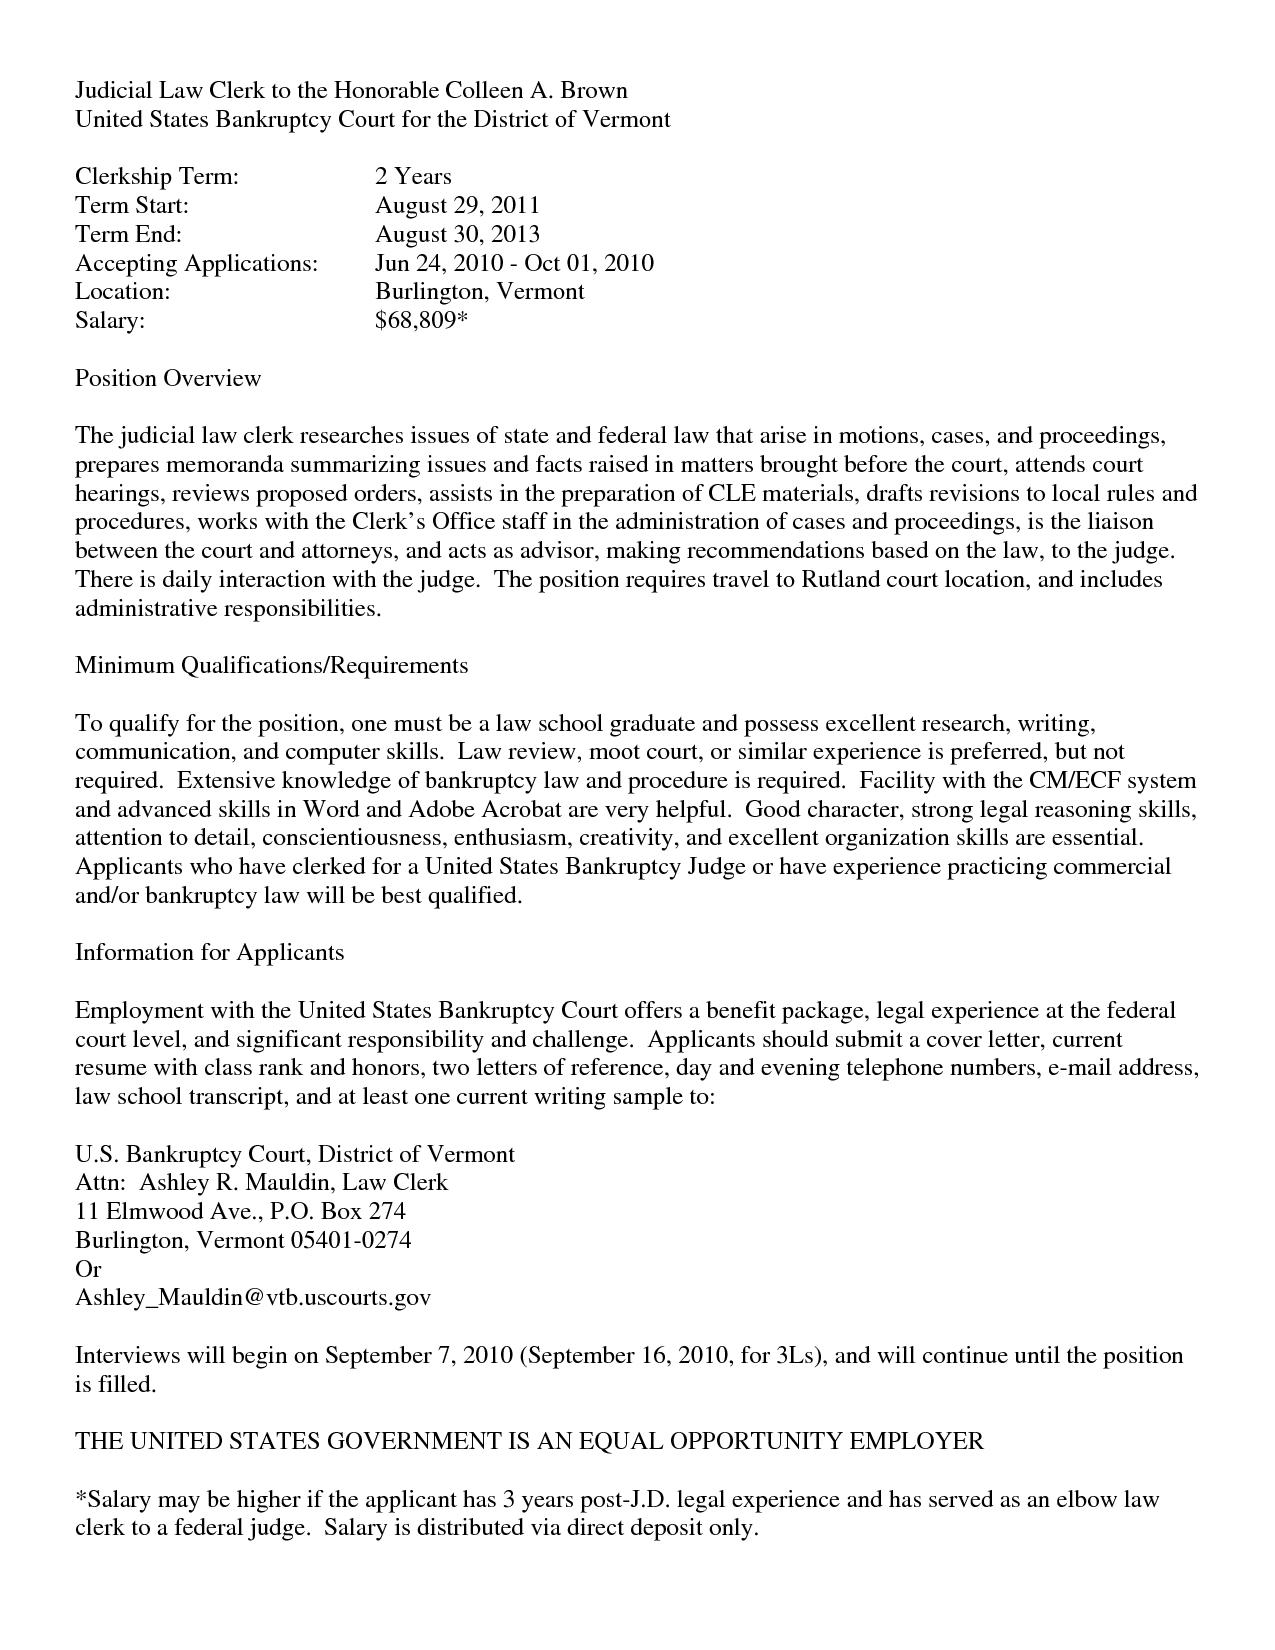 Letter Sample For Job ApplicationReference